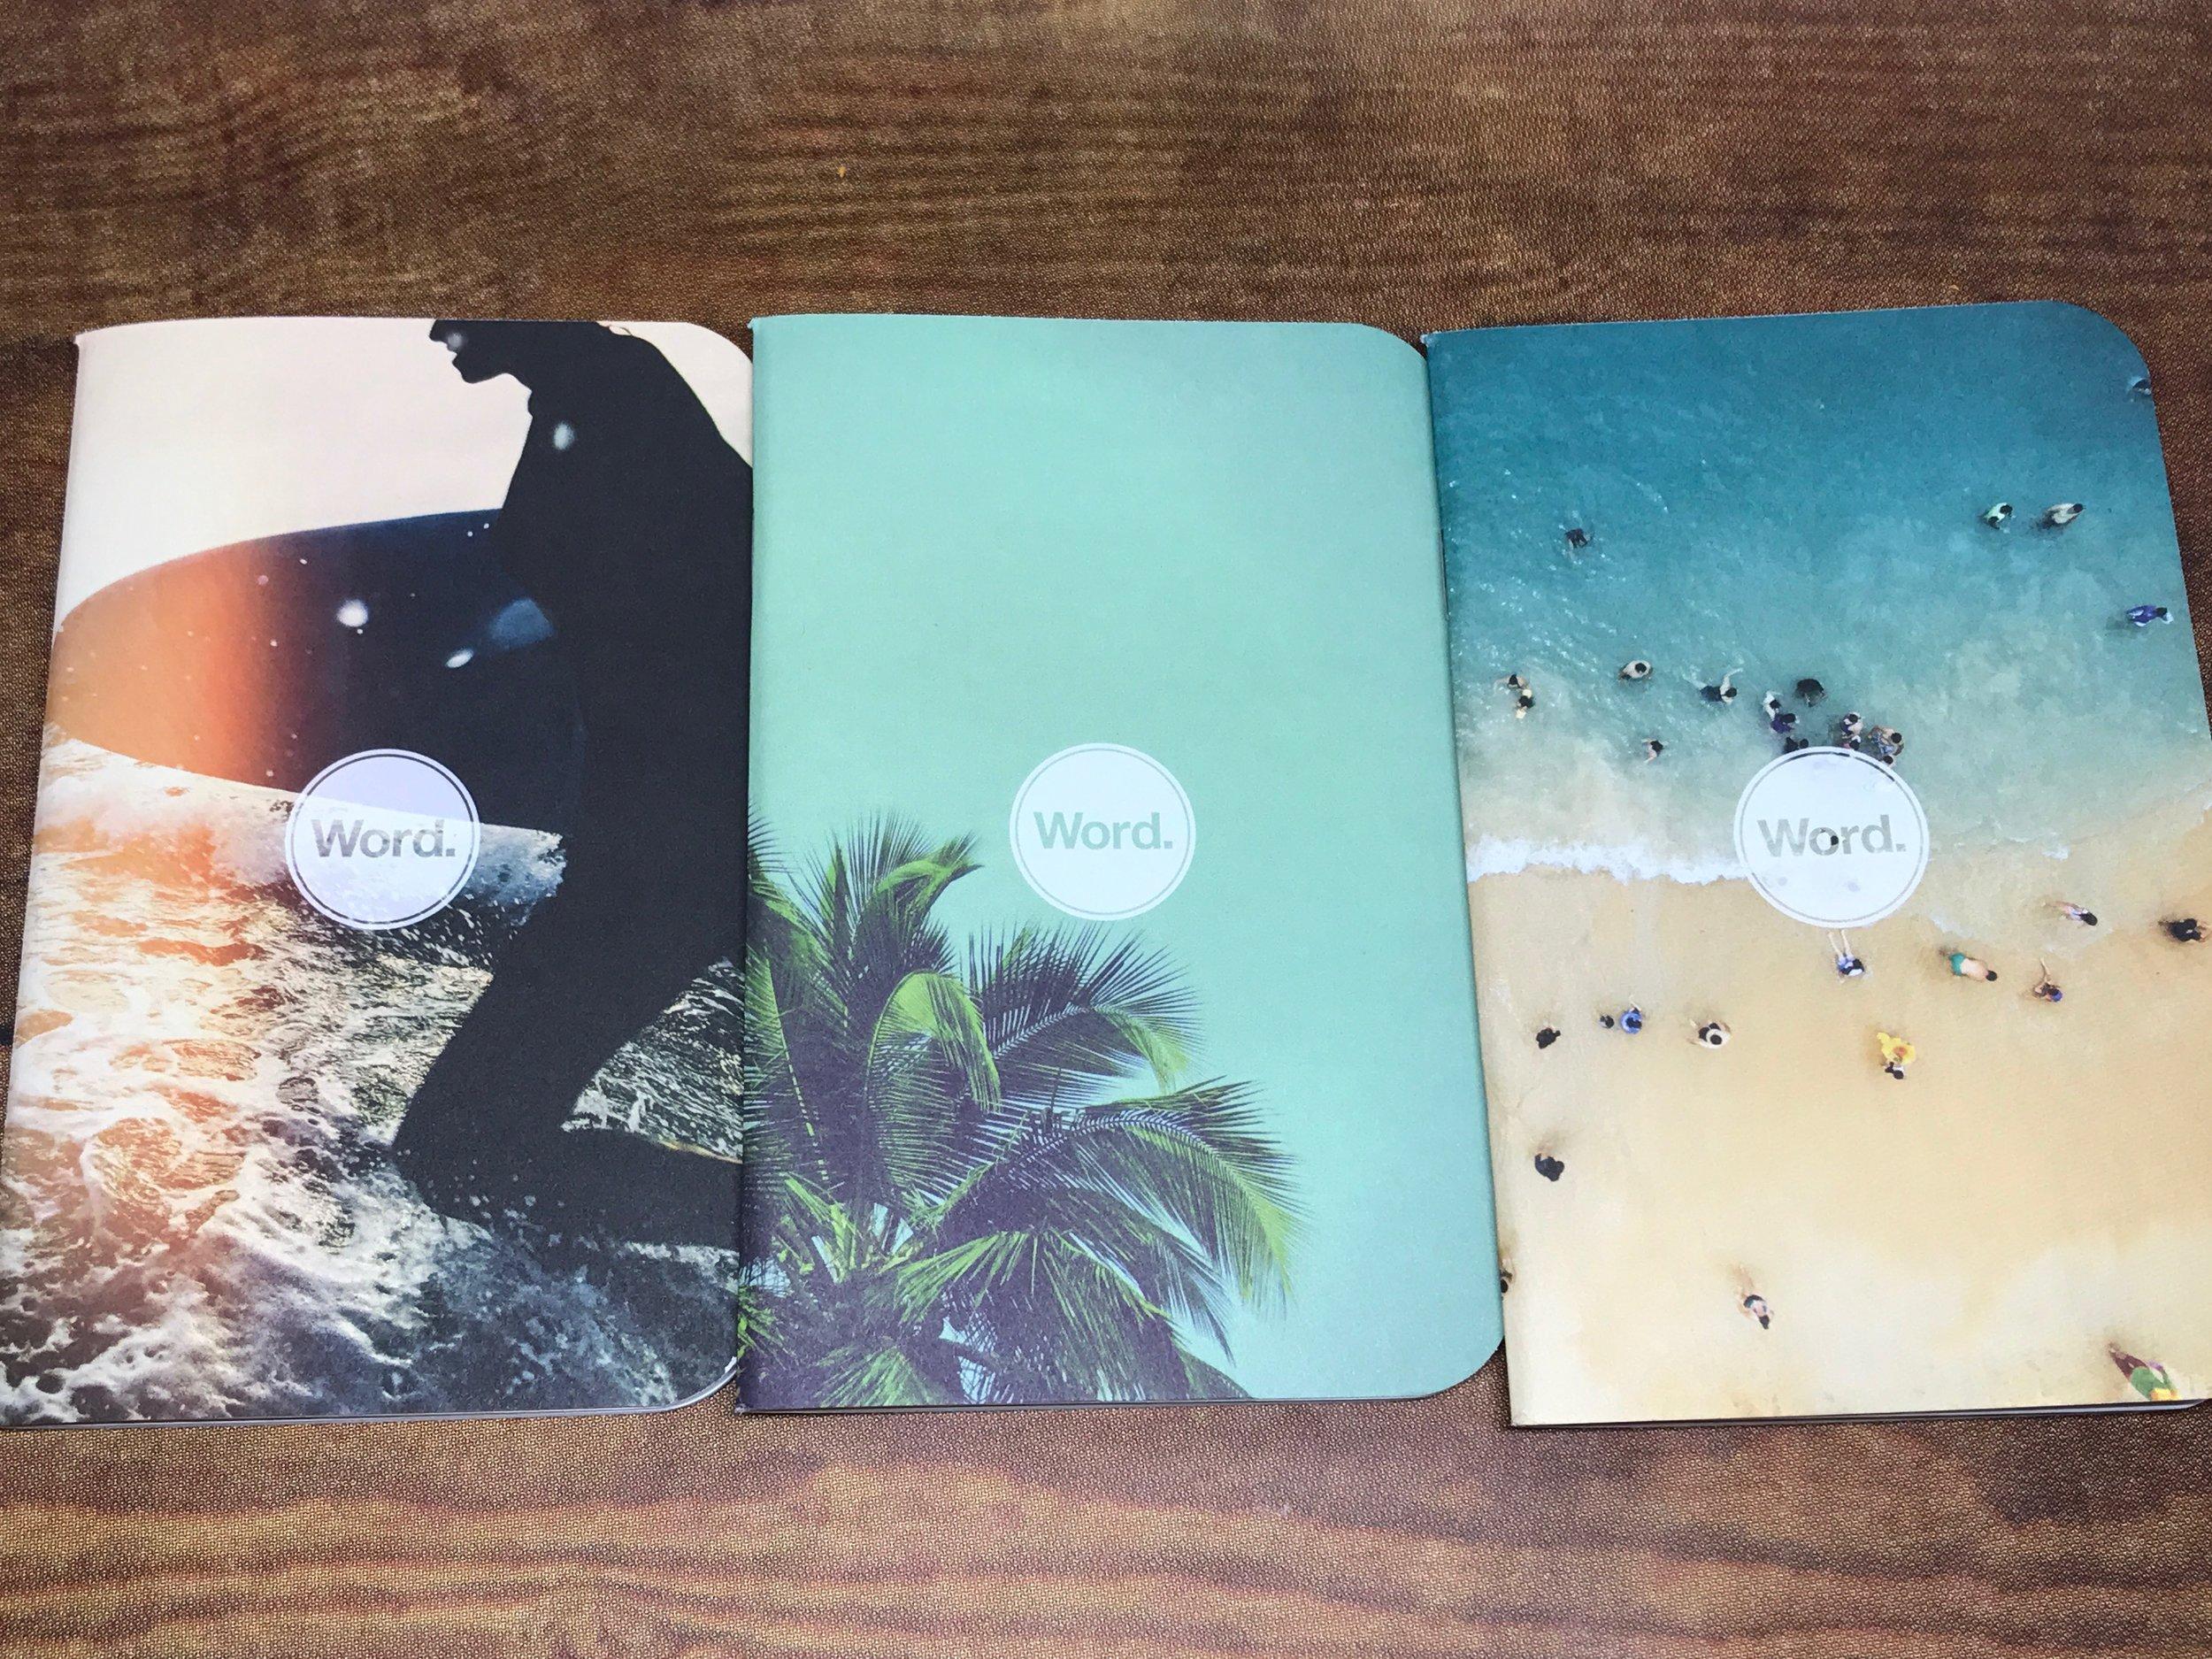 word-notebooks-beach-vibes-3.jpg